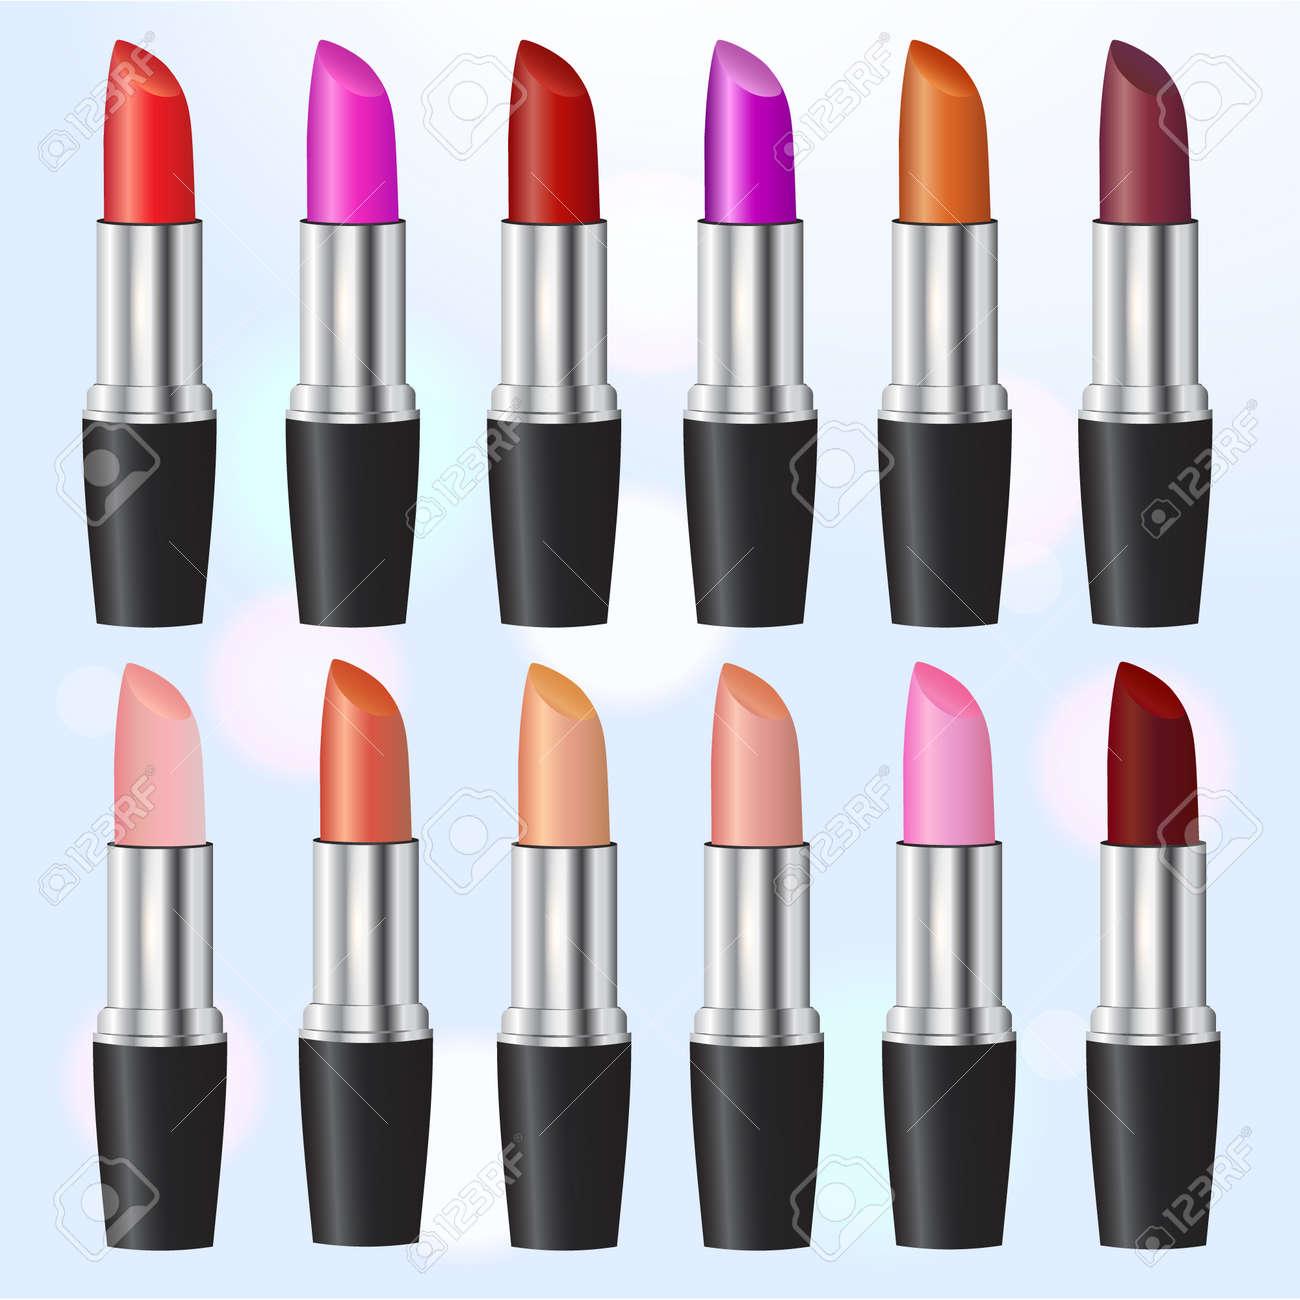 fashion lipstick ads colorful